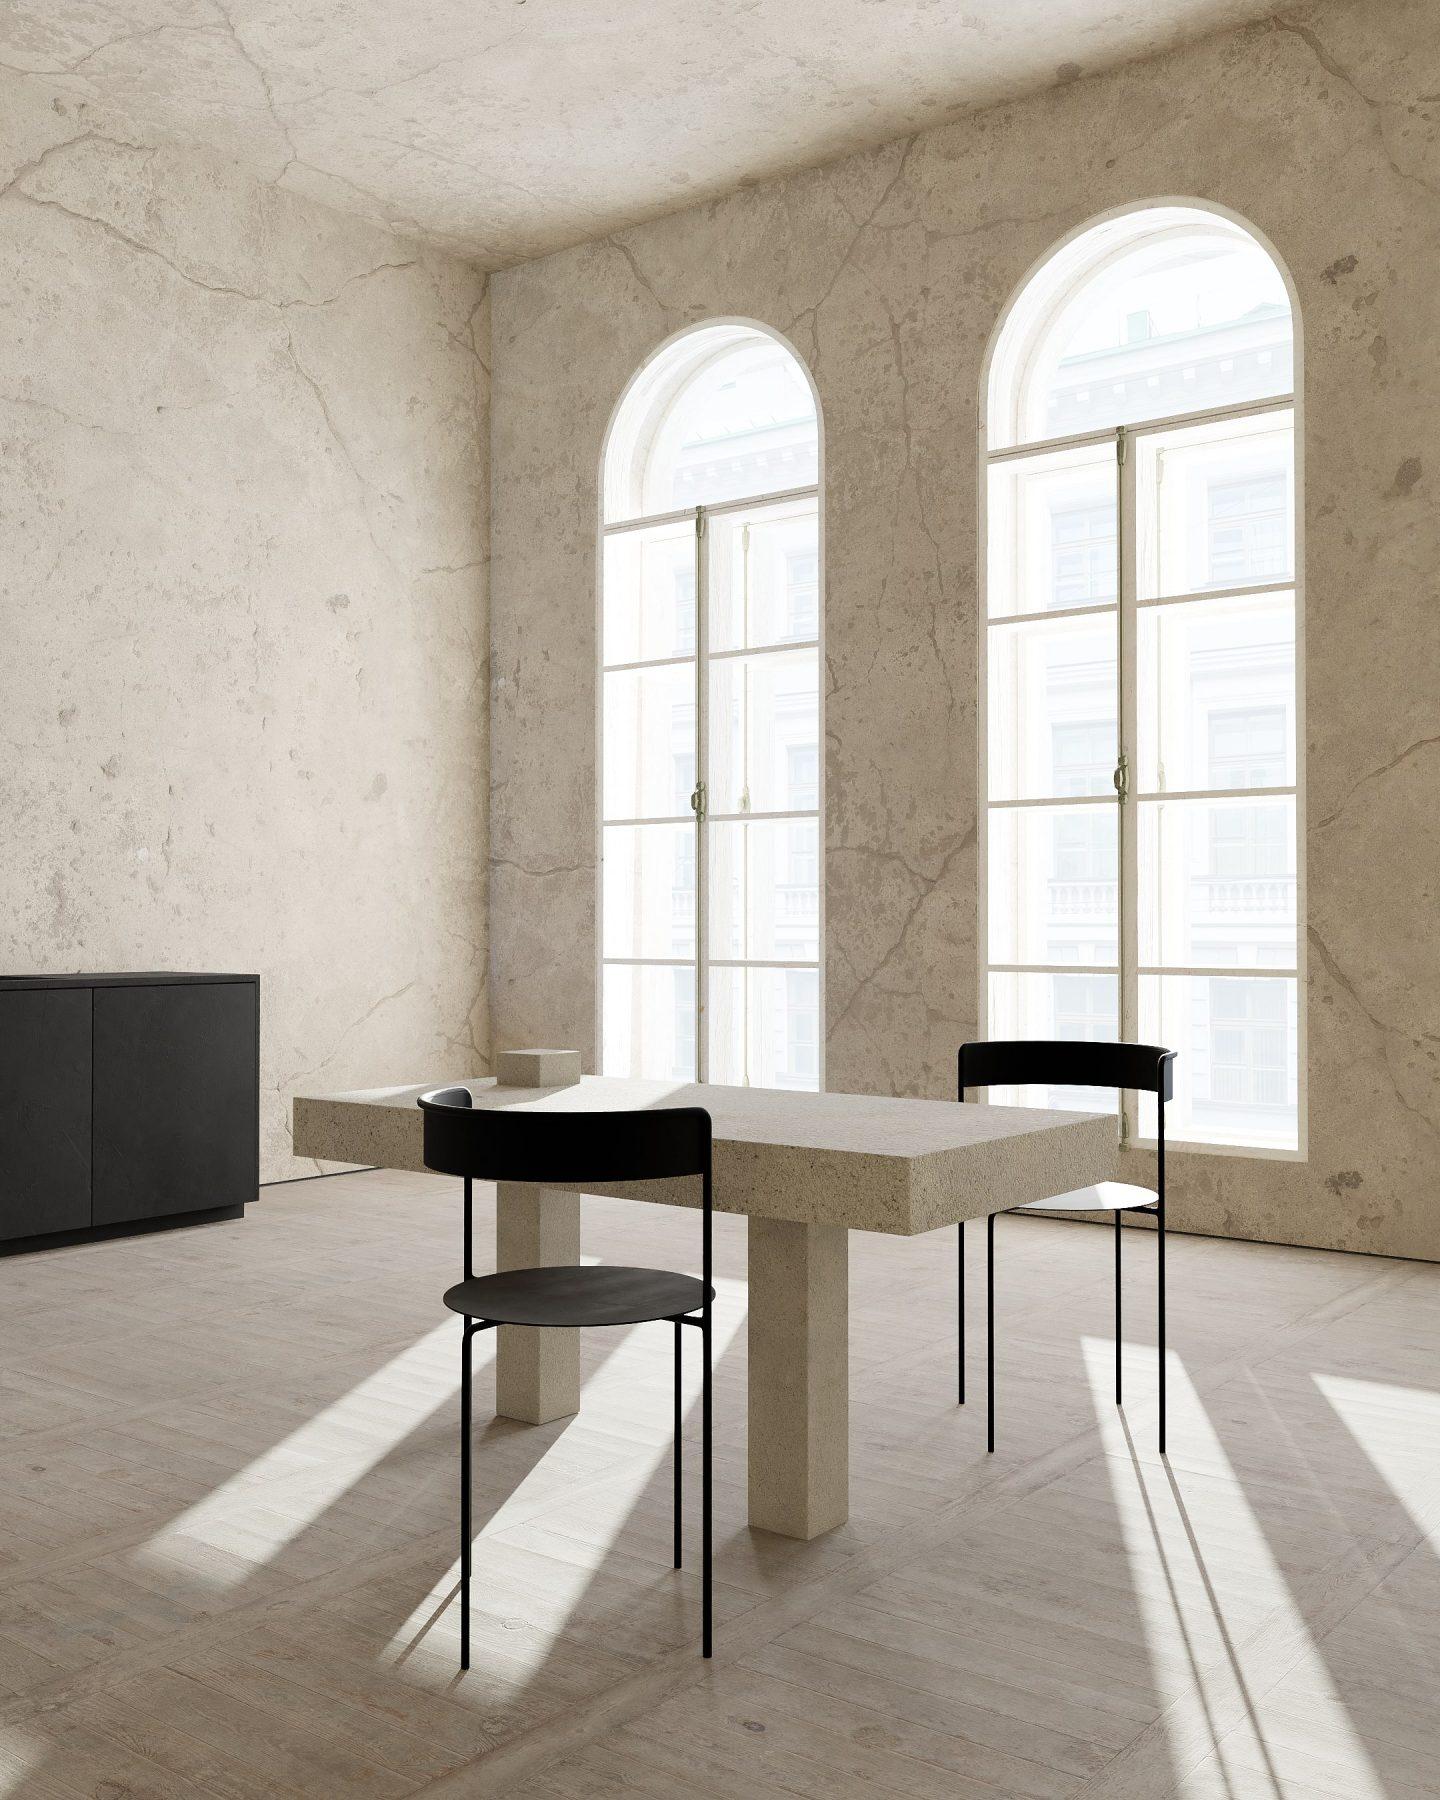 IGNANT-Design-Interview-Osminina-28